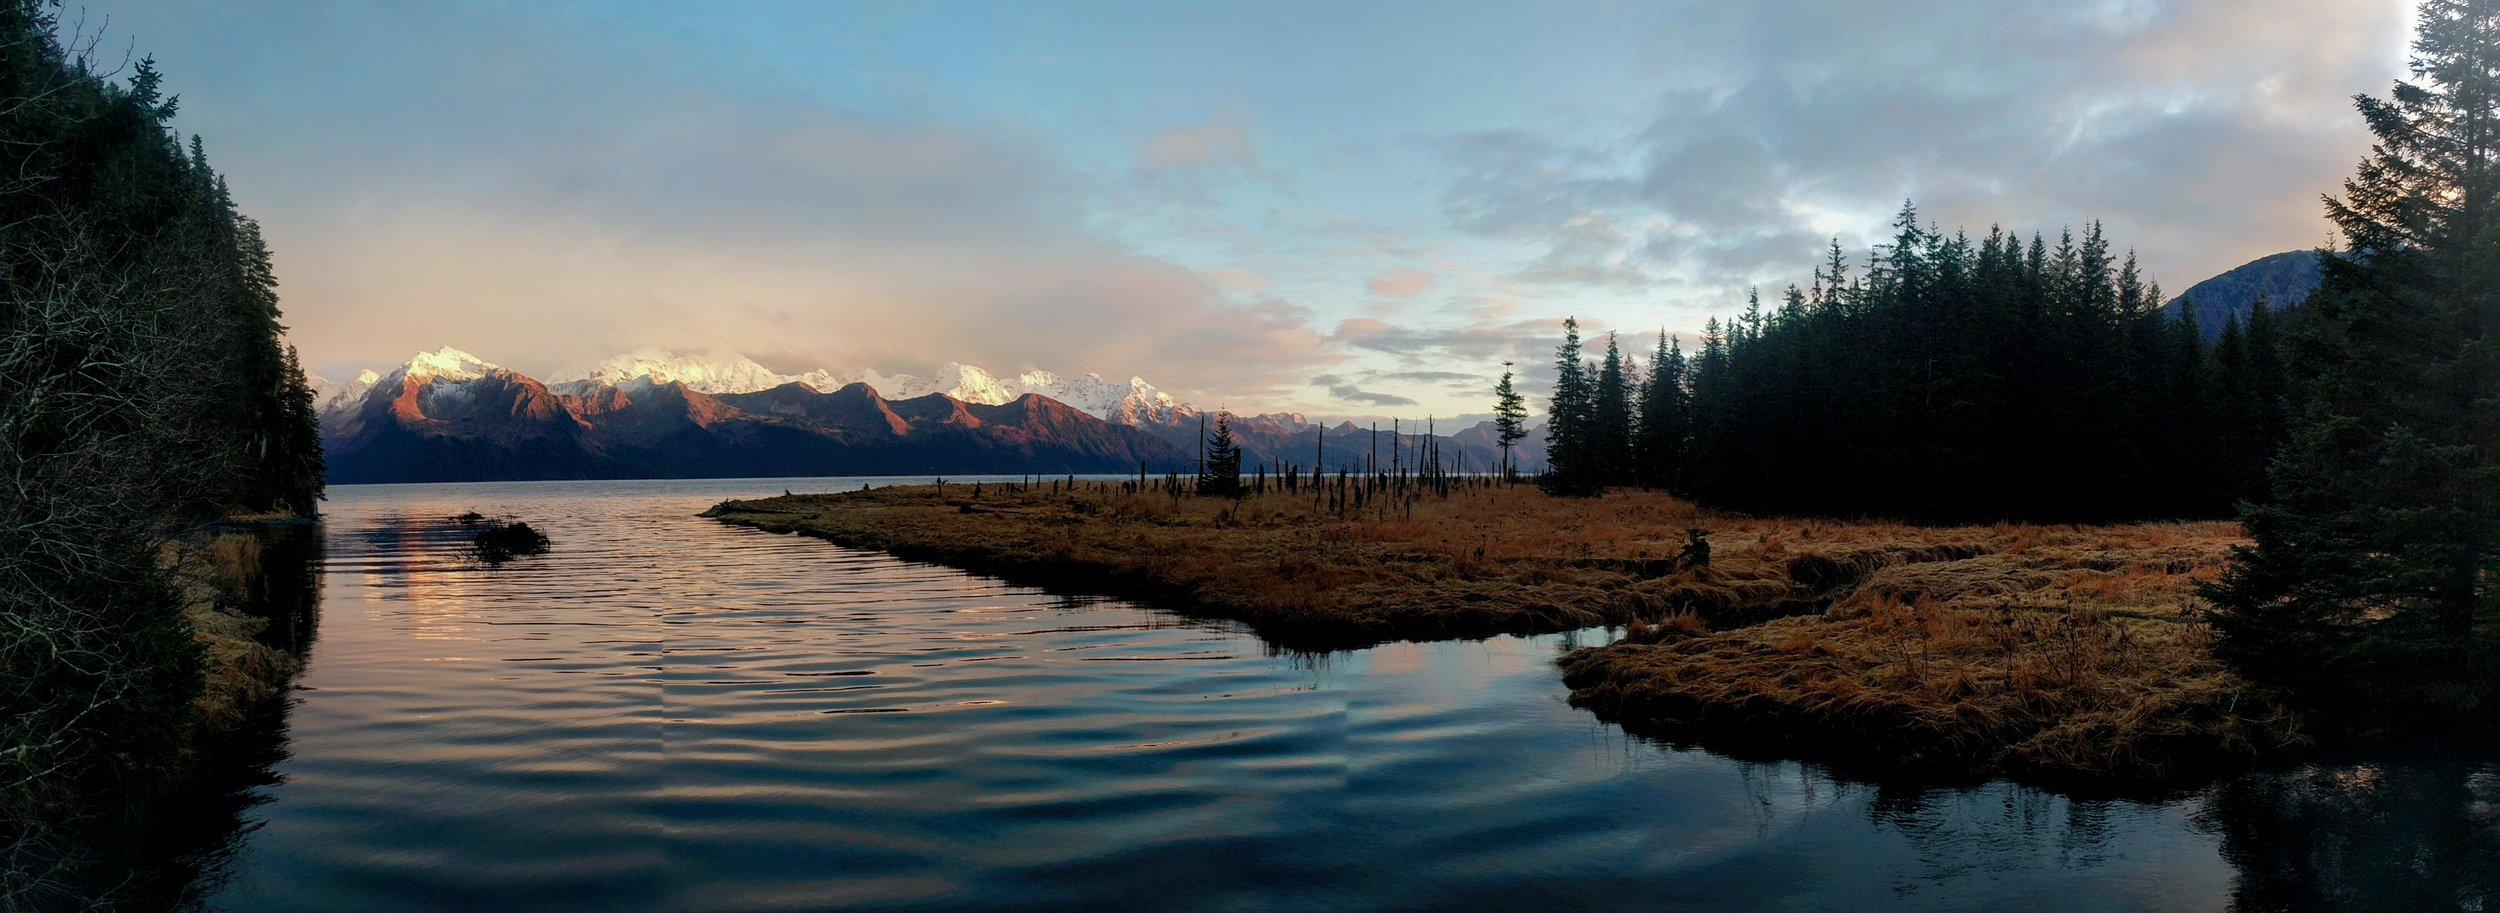 Late evening sunset on Resurrection Bay, just south of Seward, Alaska.